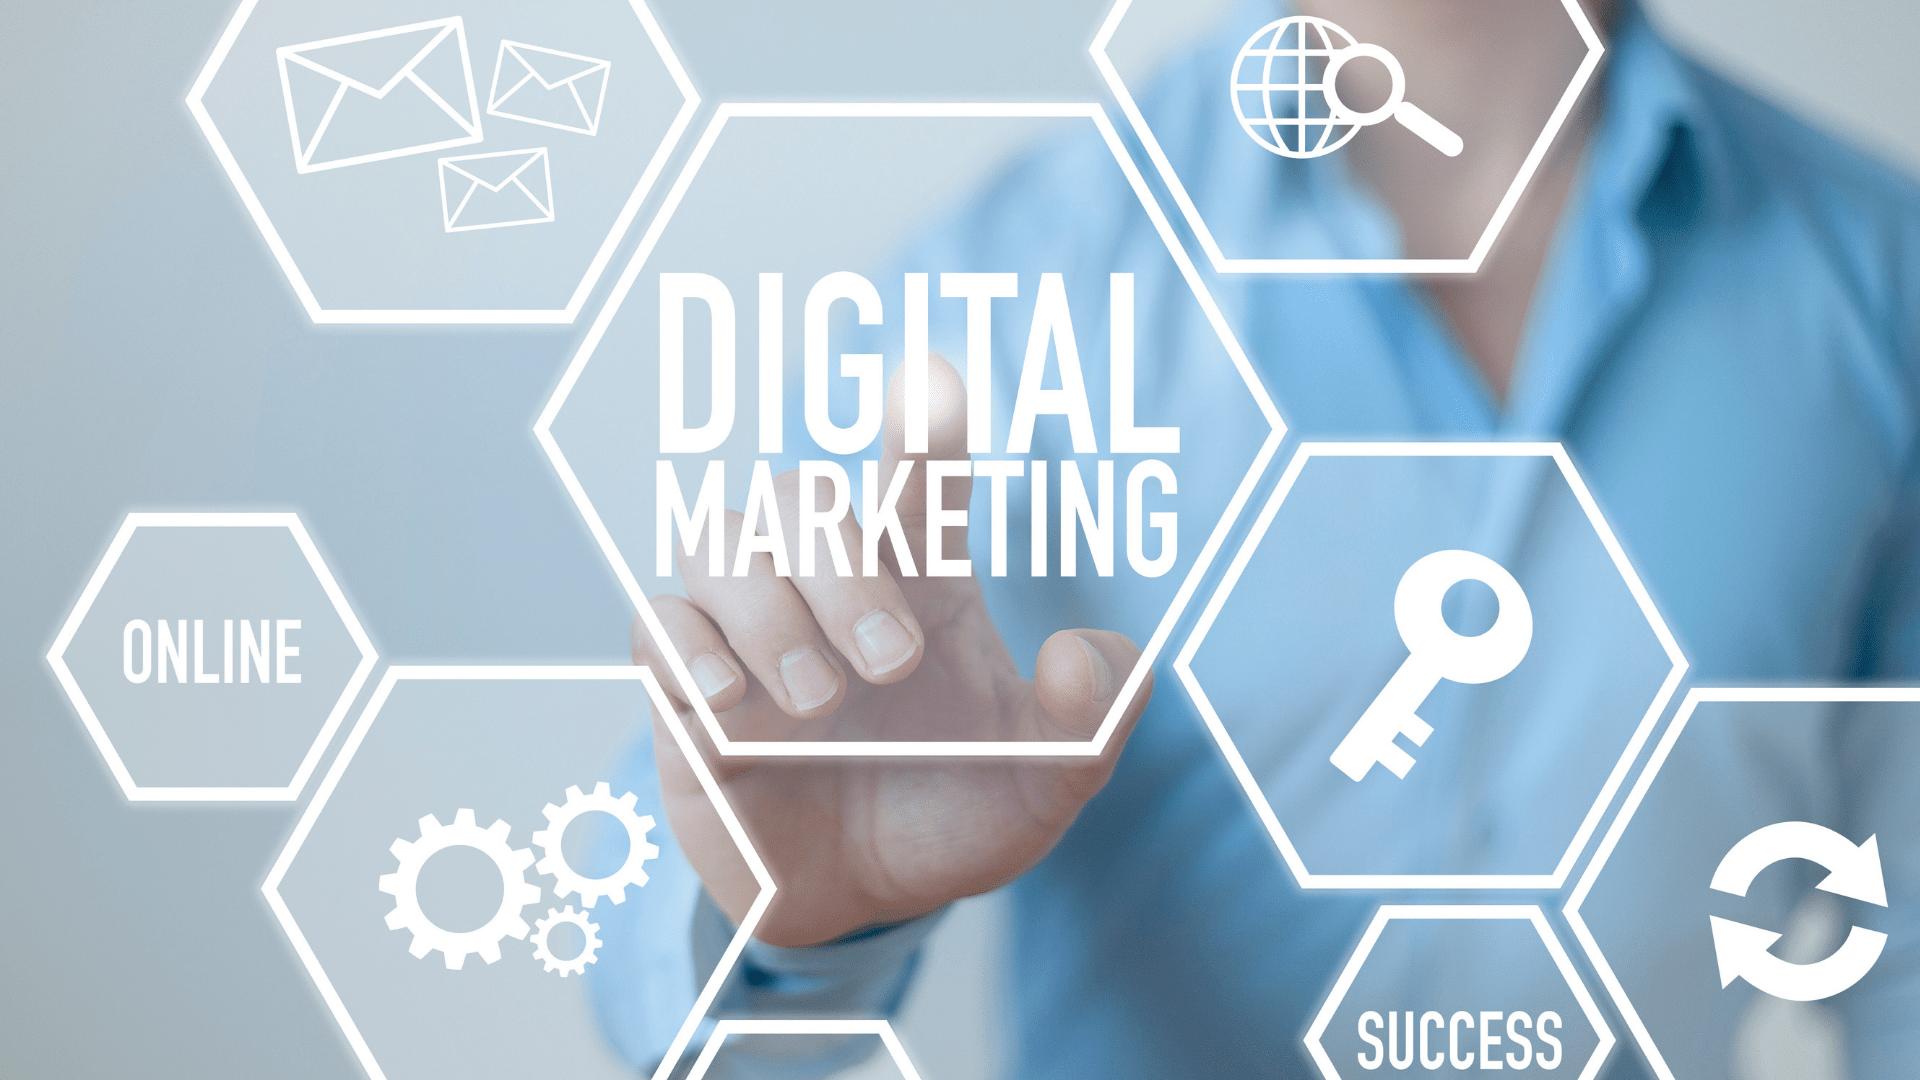 canva, marketing ,digital, marketing digital